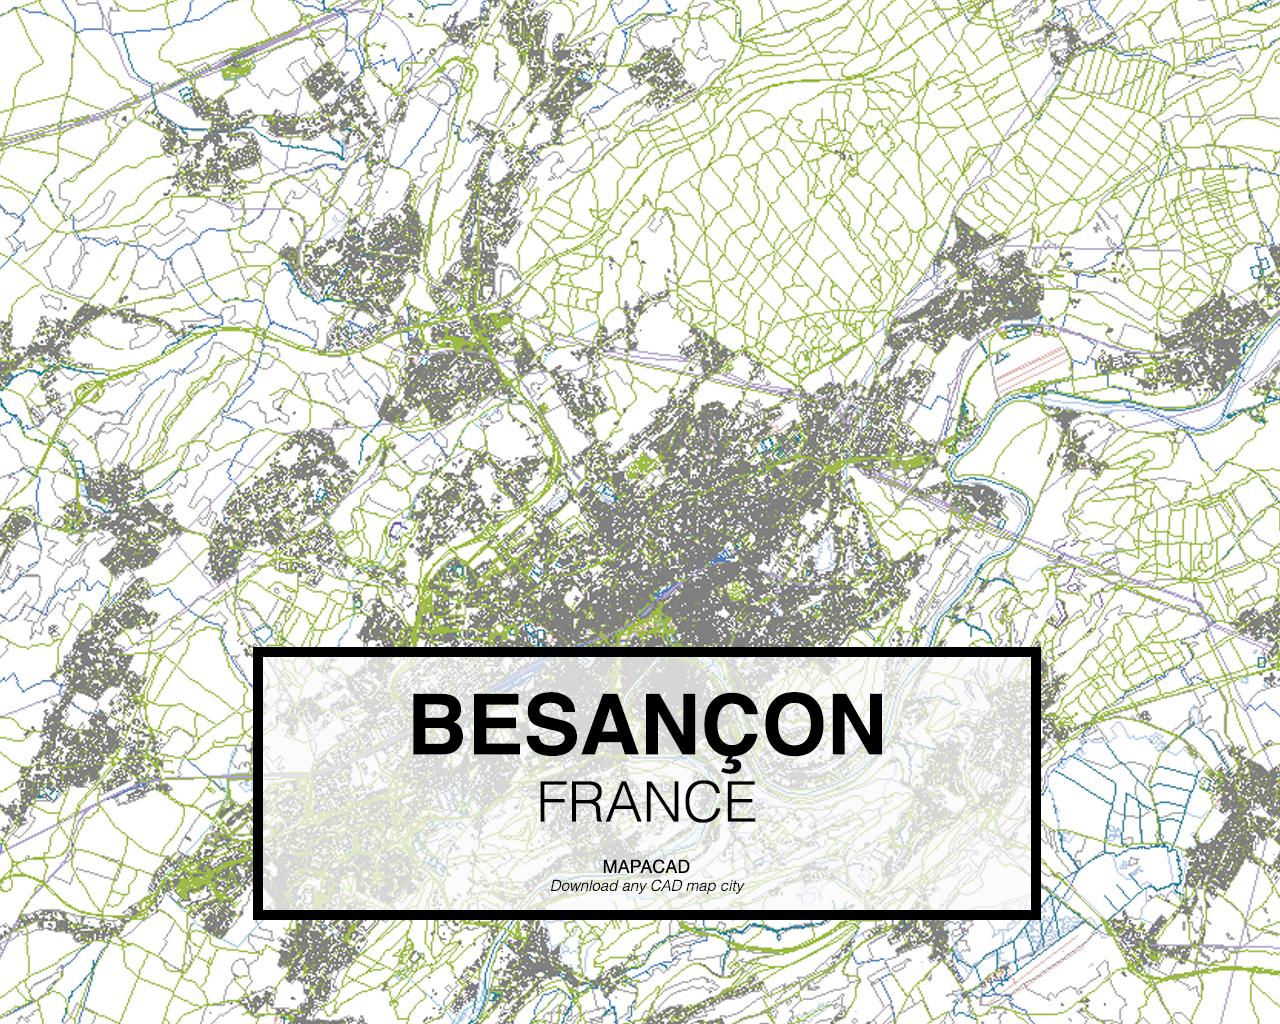 Besançon-France-01-Mapacad-download-map-cad-dwg-dxf-autocad-free-2d-3d